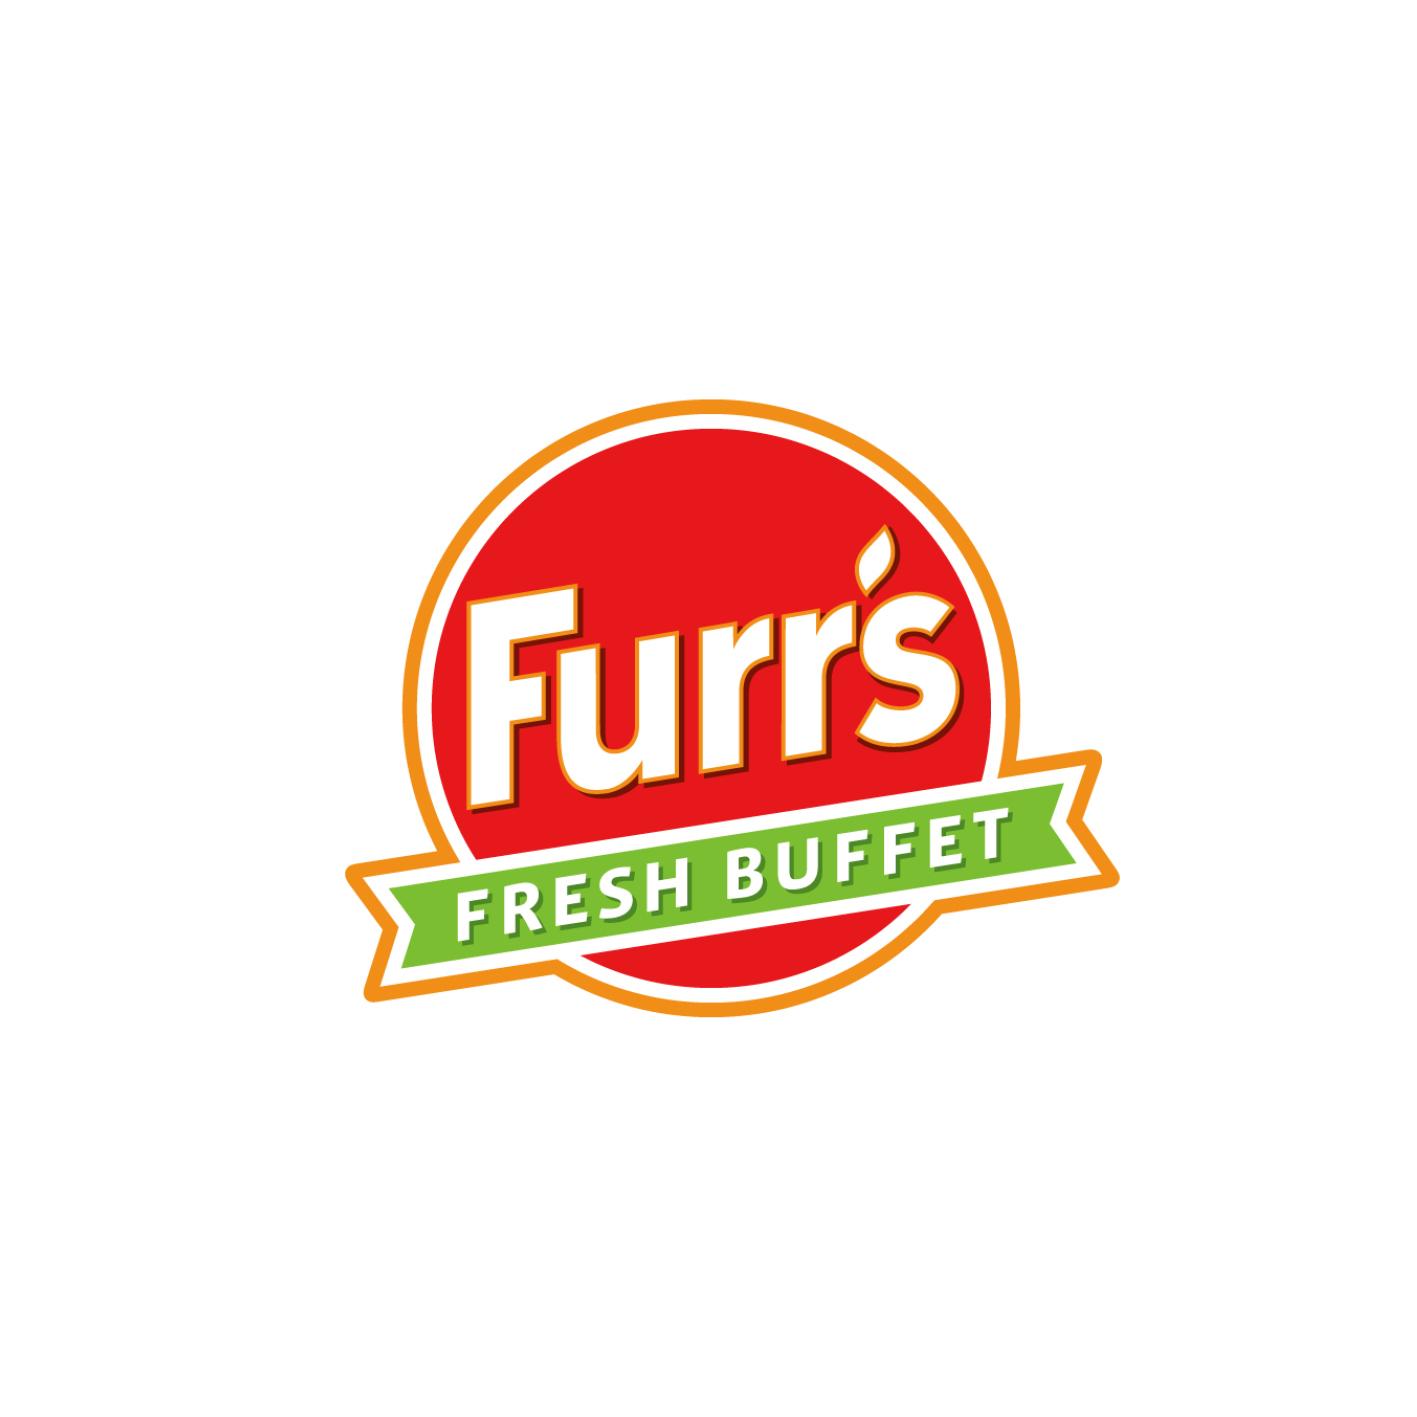 Furr's Fresh Buffet logo